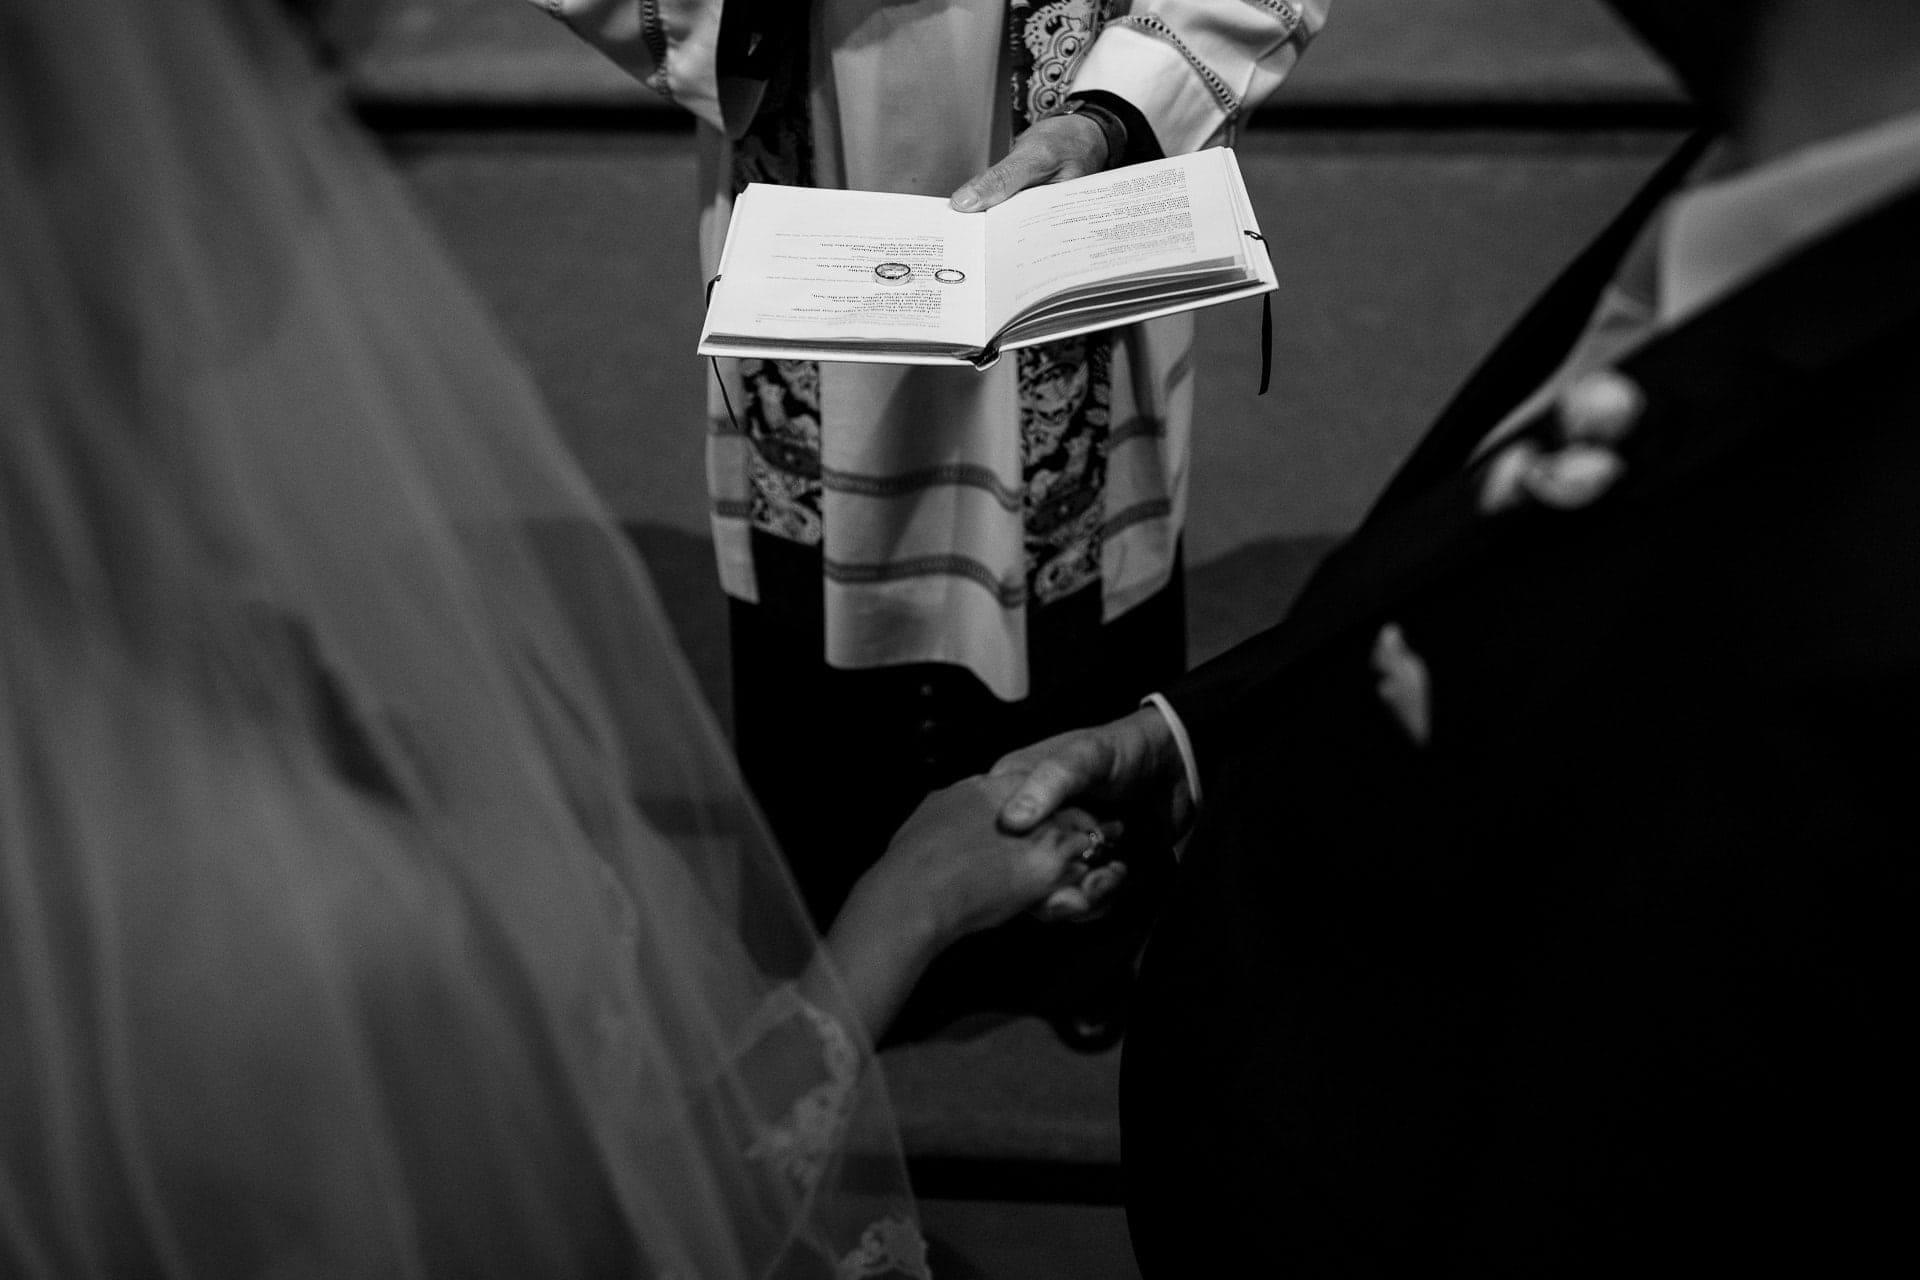 church wedding rings